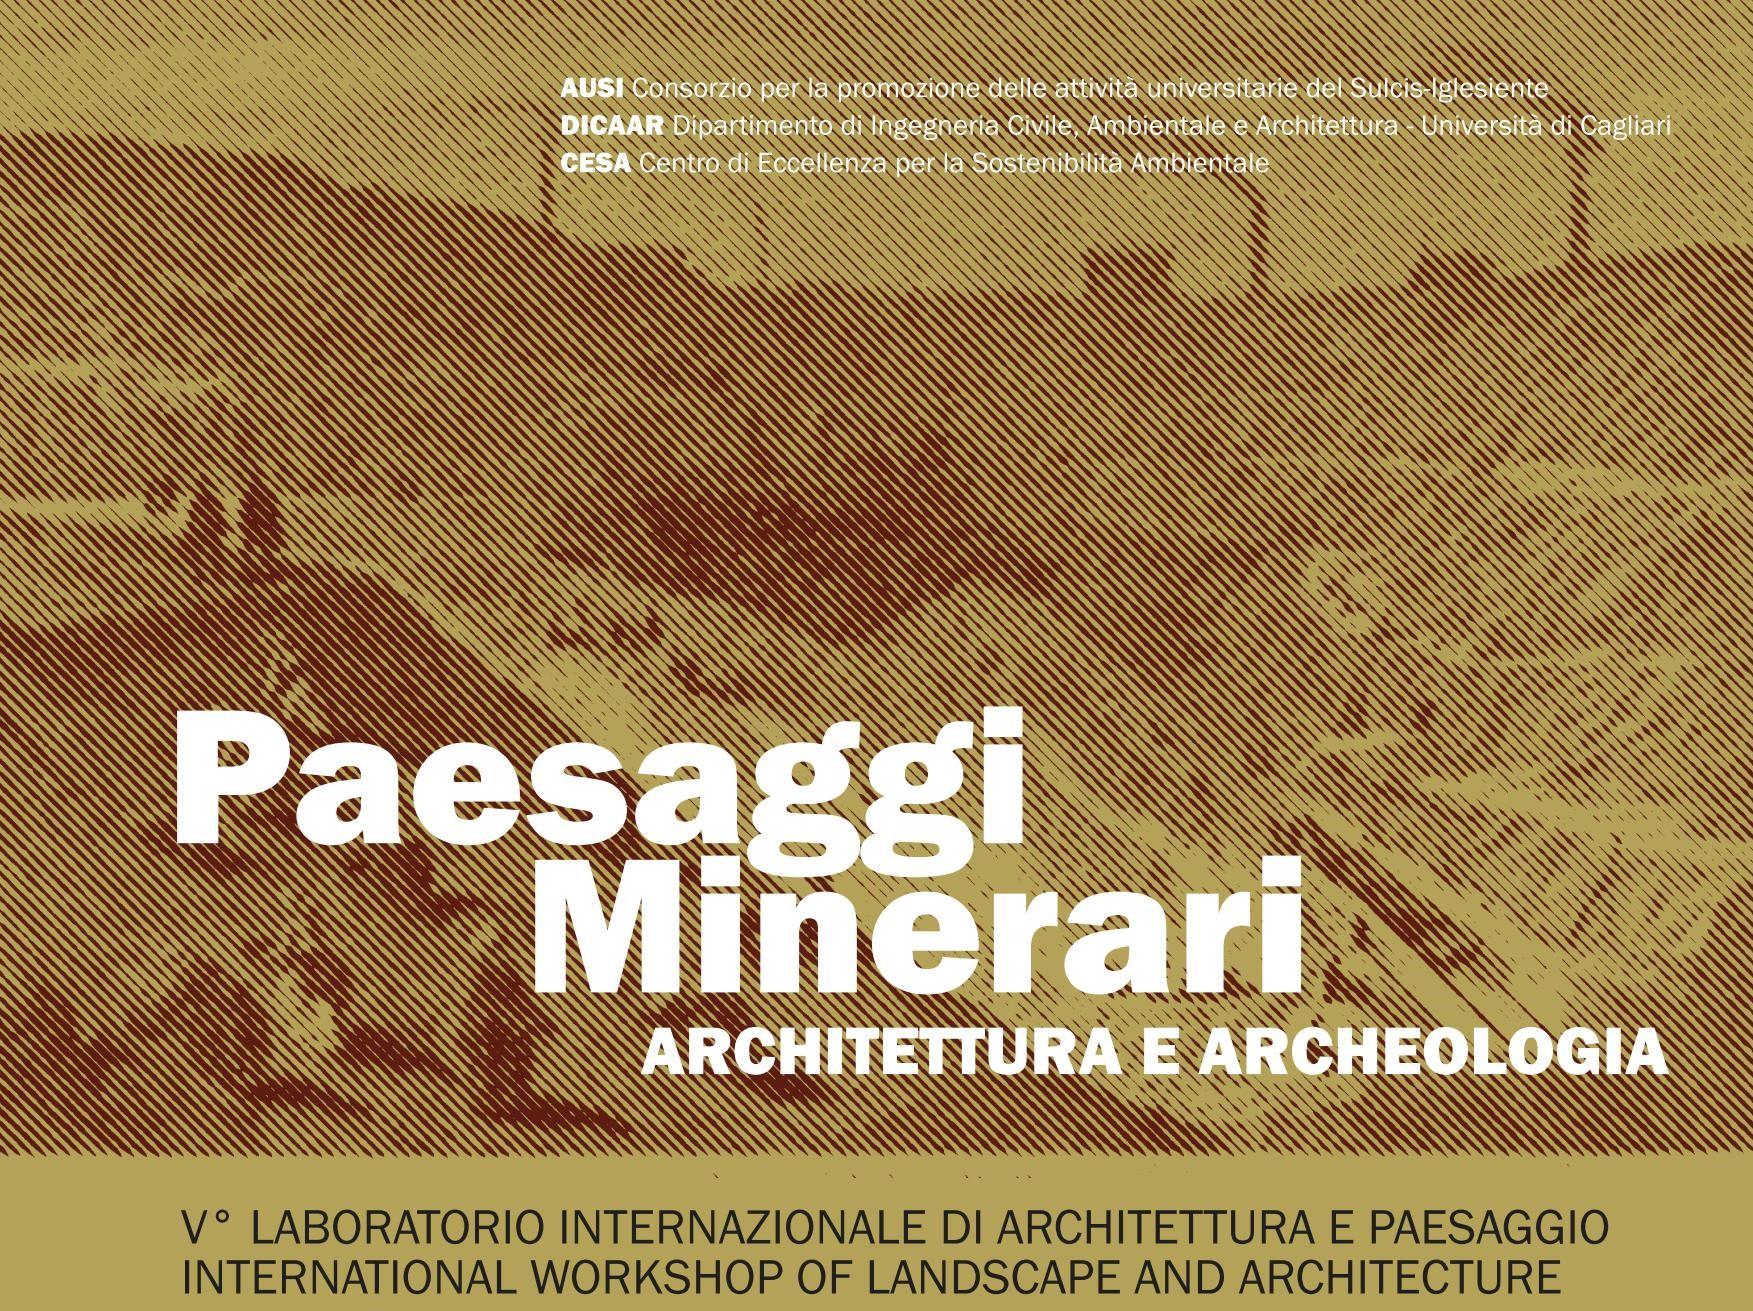 PAESAGGI MINERARI Architettura e archeologia